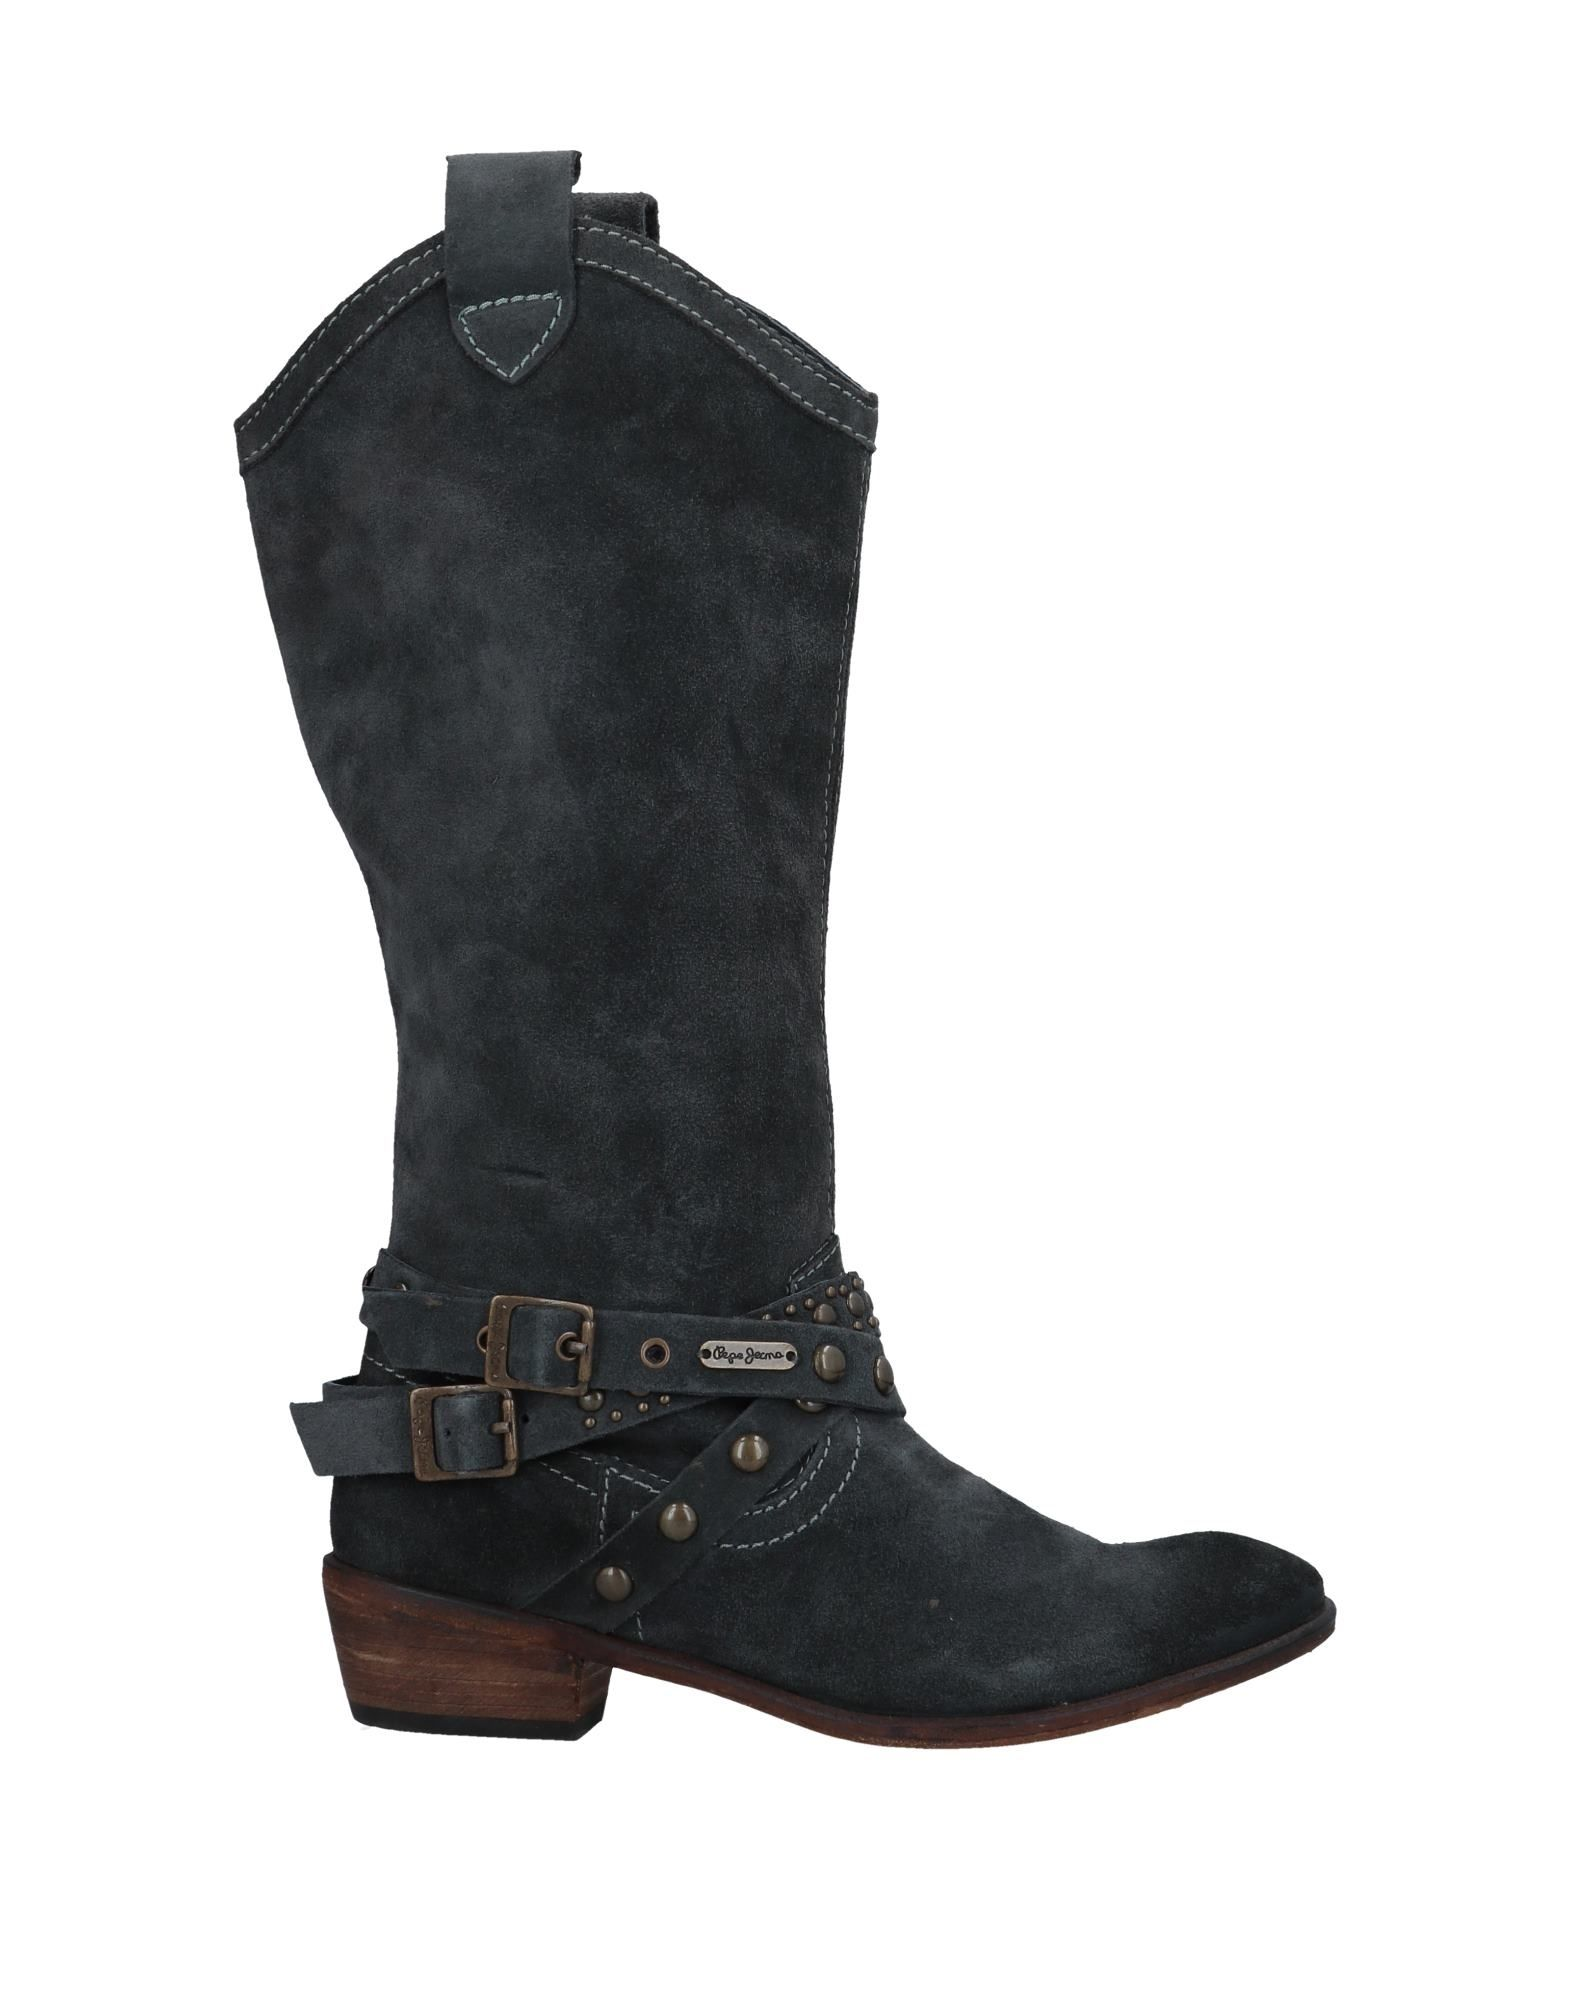 Pepe Jeans Boots - Women Pepe Jeans Boots online 11533920AJ on  Australia - 11533920AJ online 172b9f